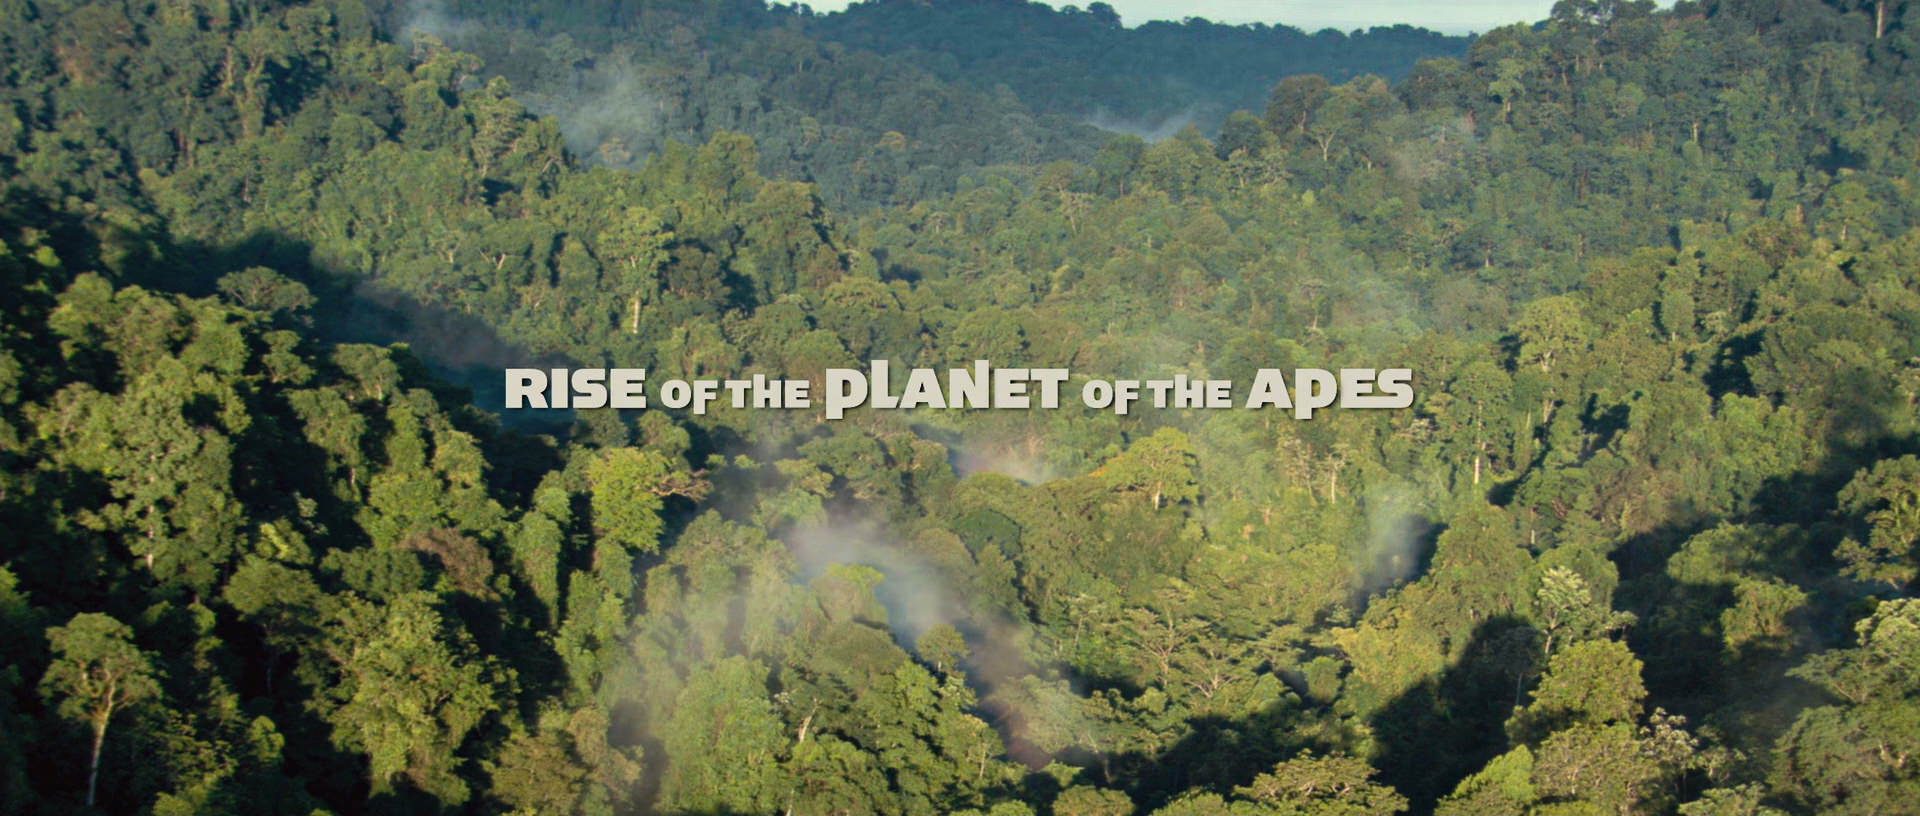 Rise Of The Planet Of The Apes 2011 Movie Screencaps Com